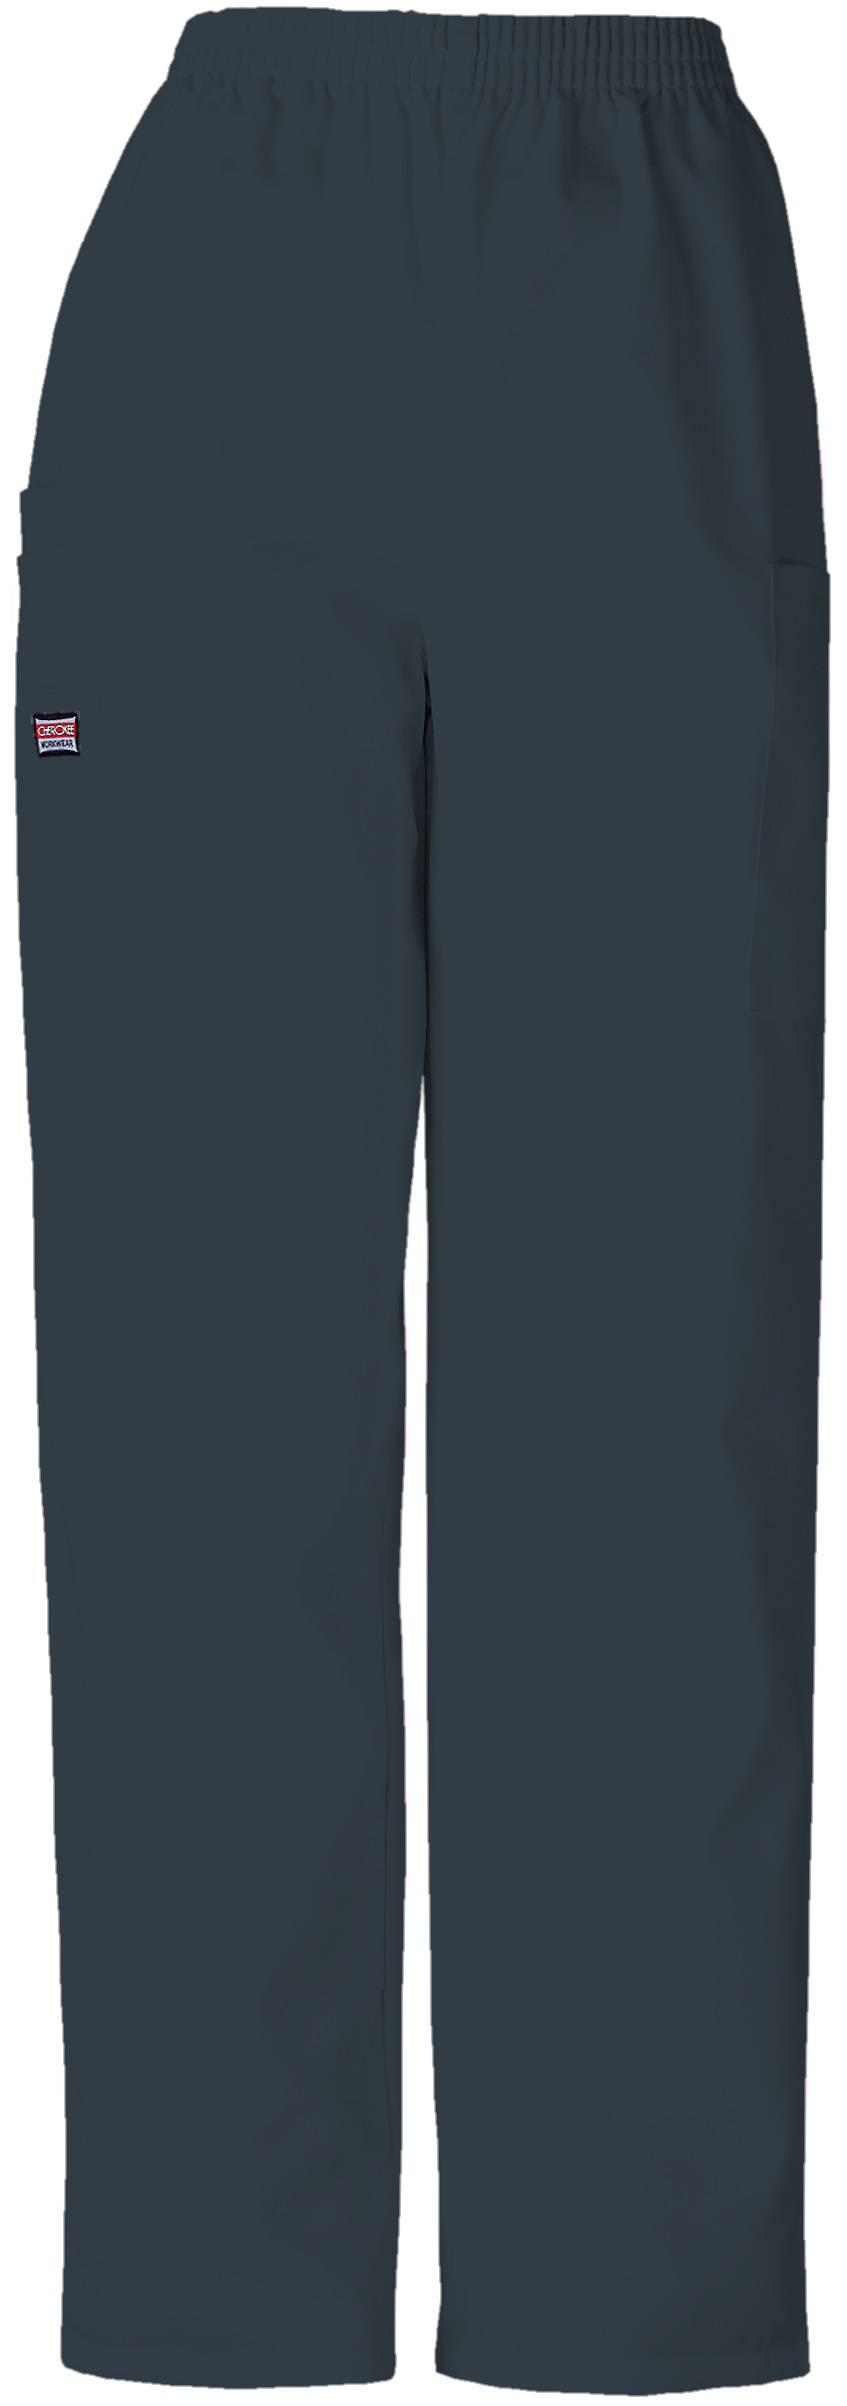 Cherokee Workwear Women 4200 Elastic Waist Scrub Pant Regular/Petite/Tall Pewter